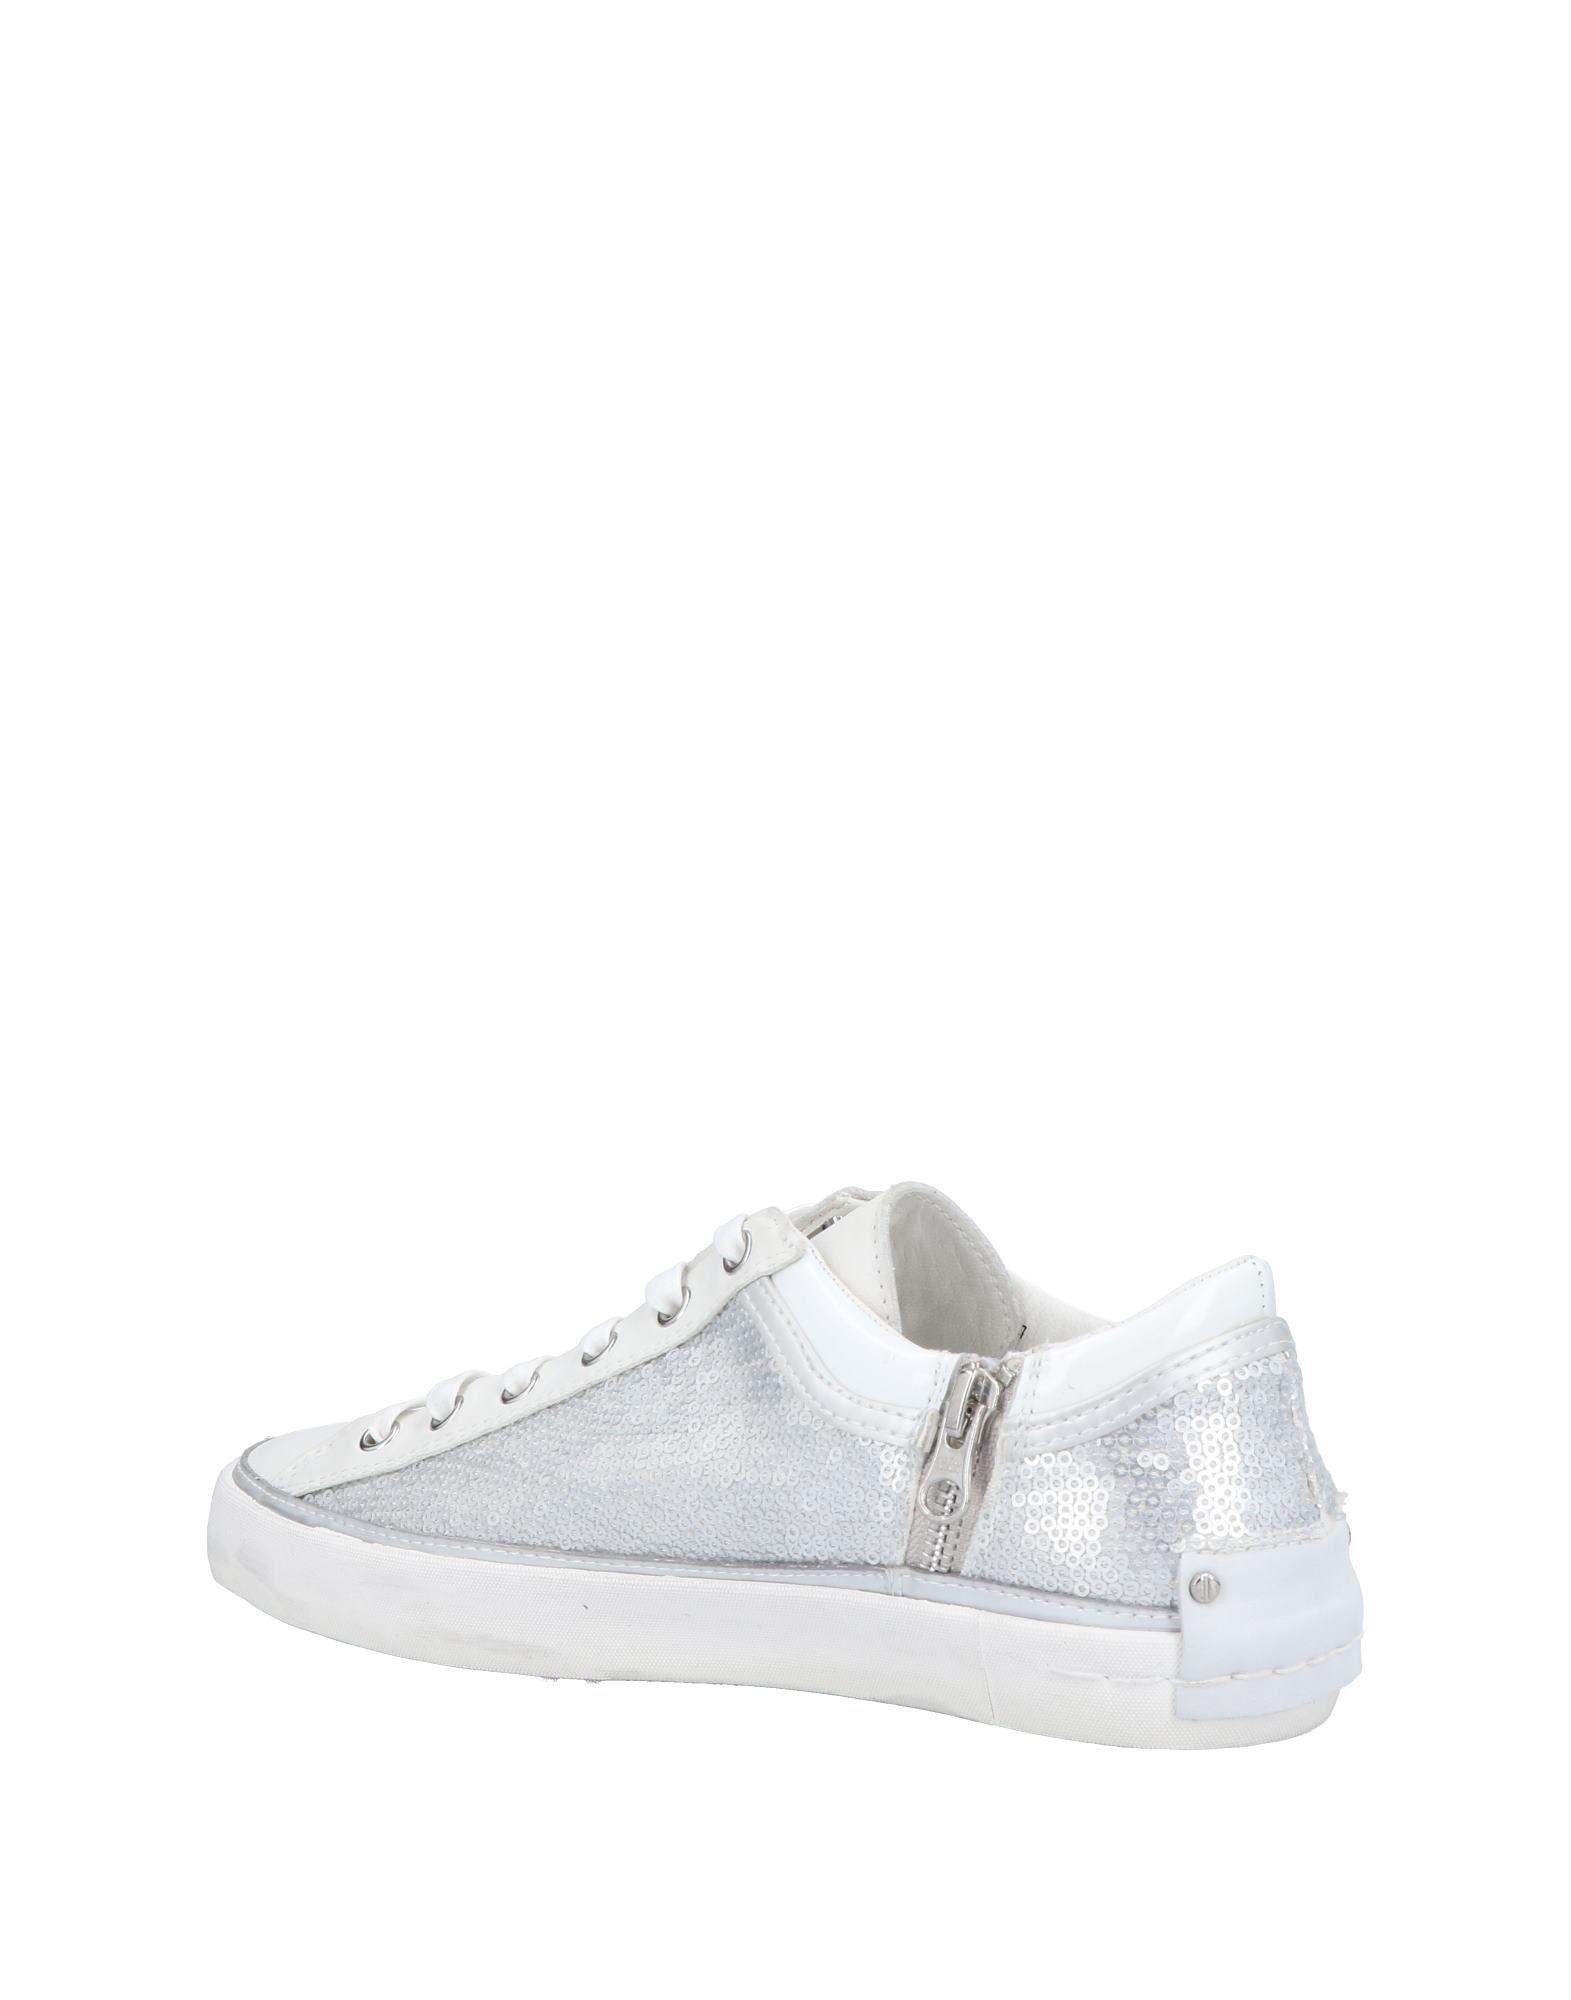 Crime London Sneakers - - - Women Crime London Sneakers online on  Canada - 11468256GE 27207c